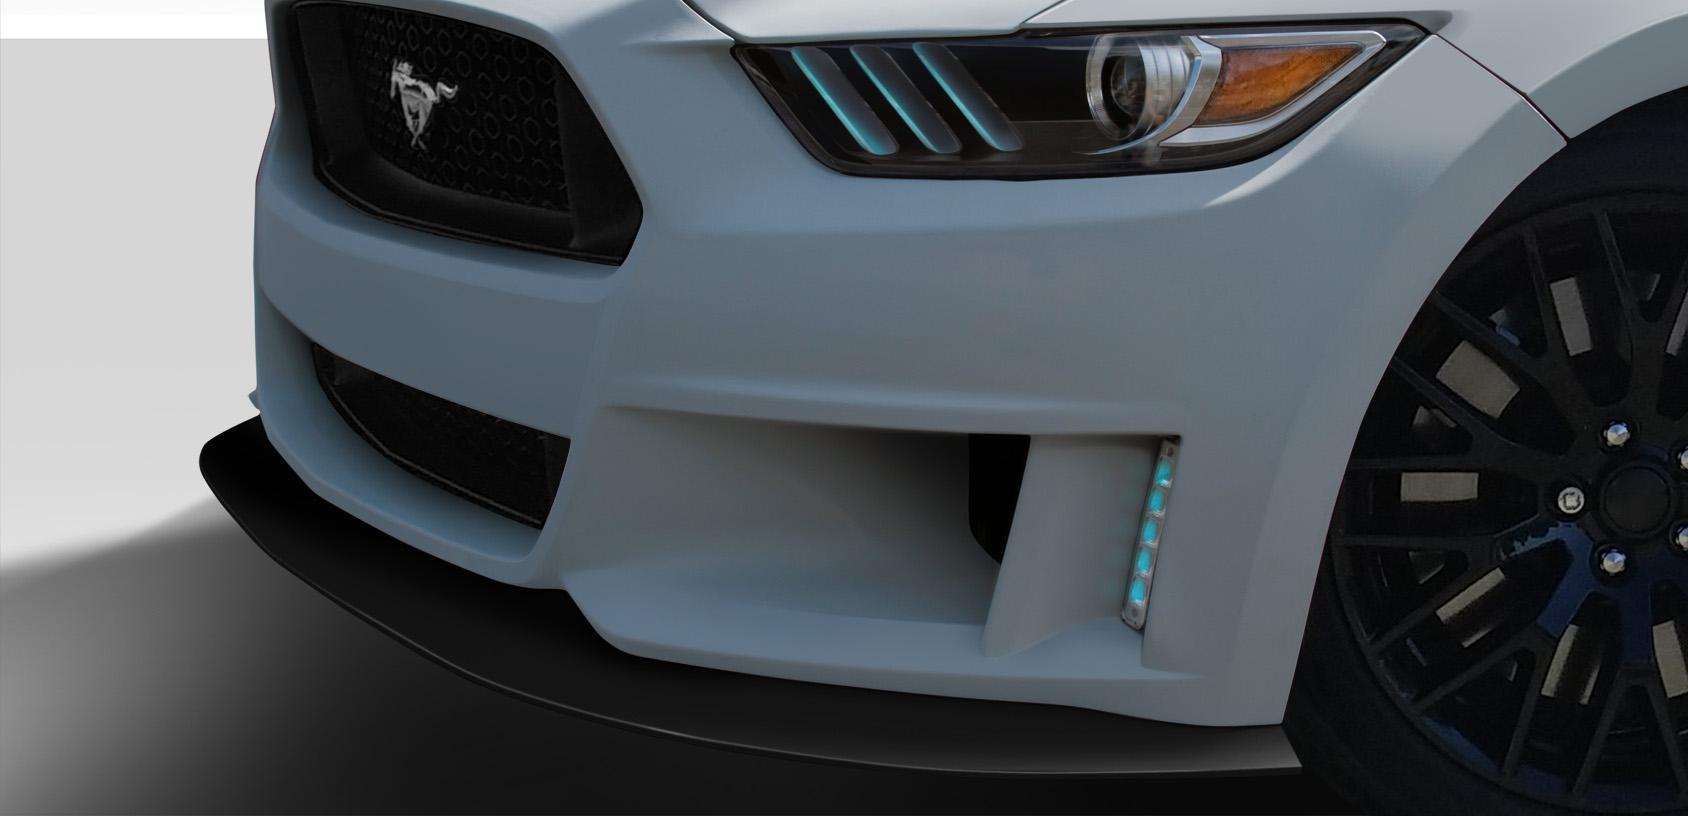 2015-2017 Ford Mustang Duraflex Grid Front Lip